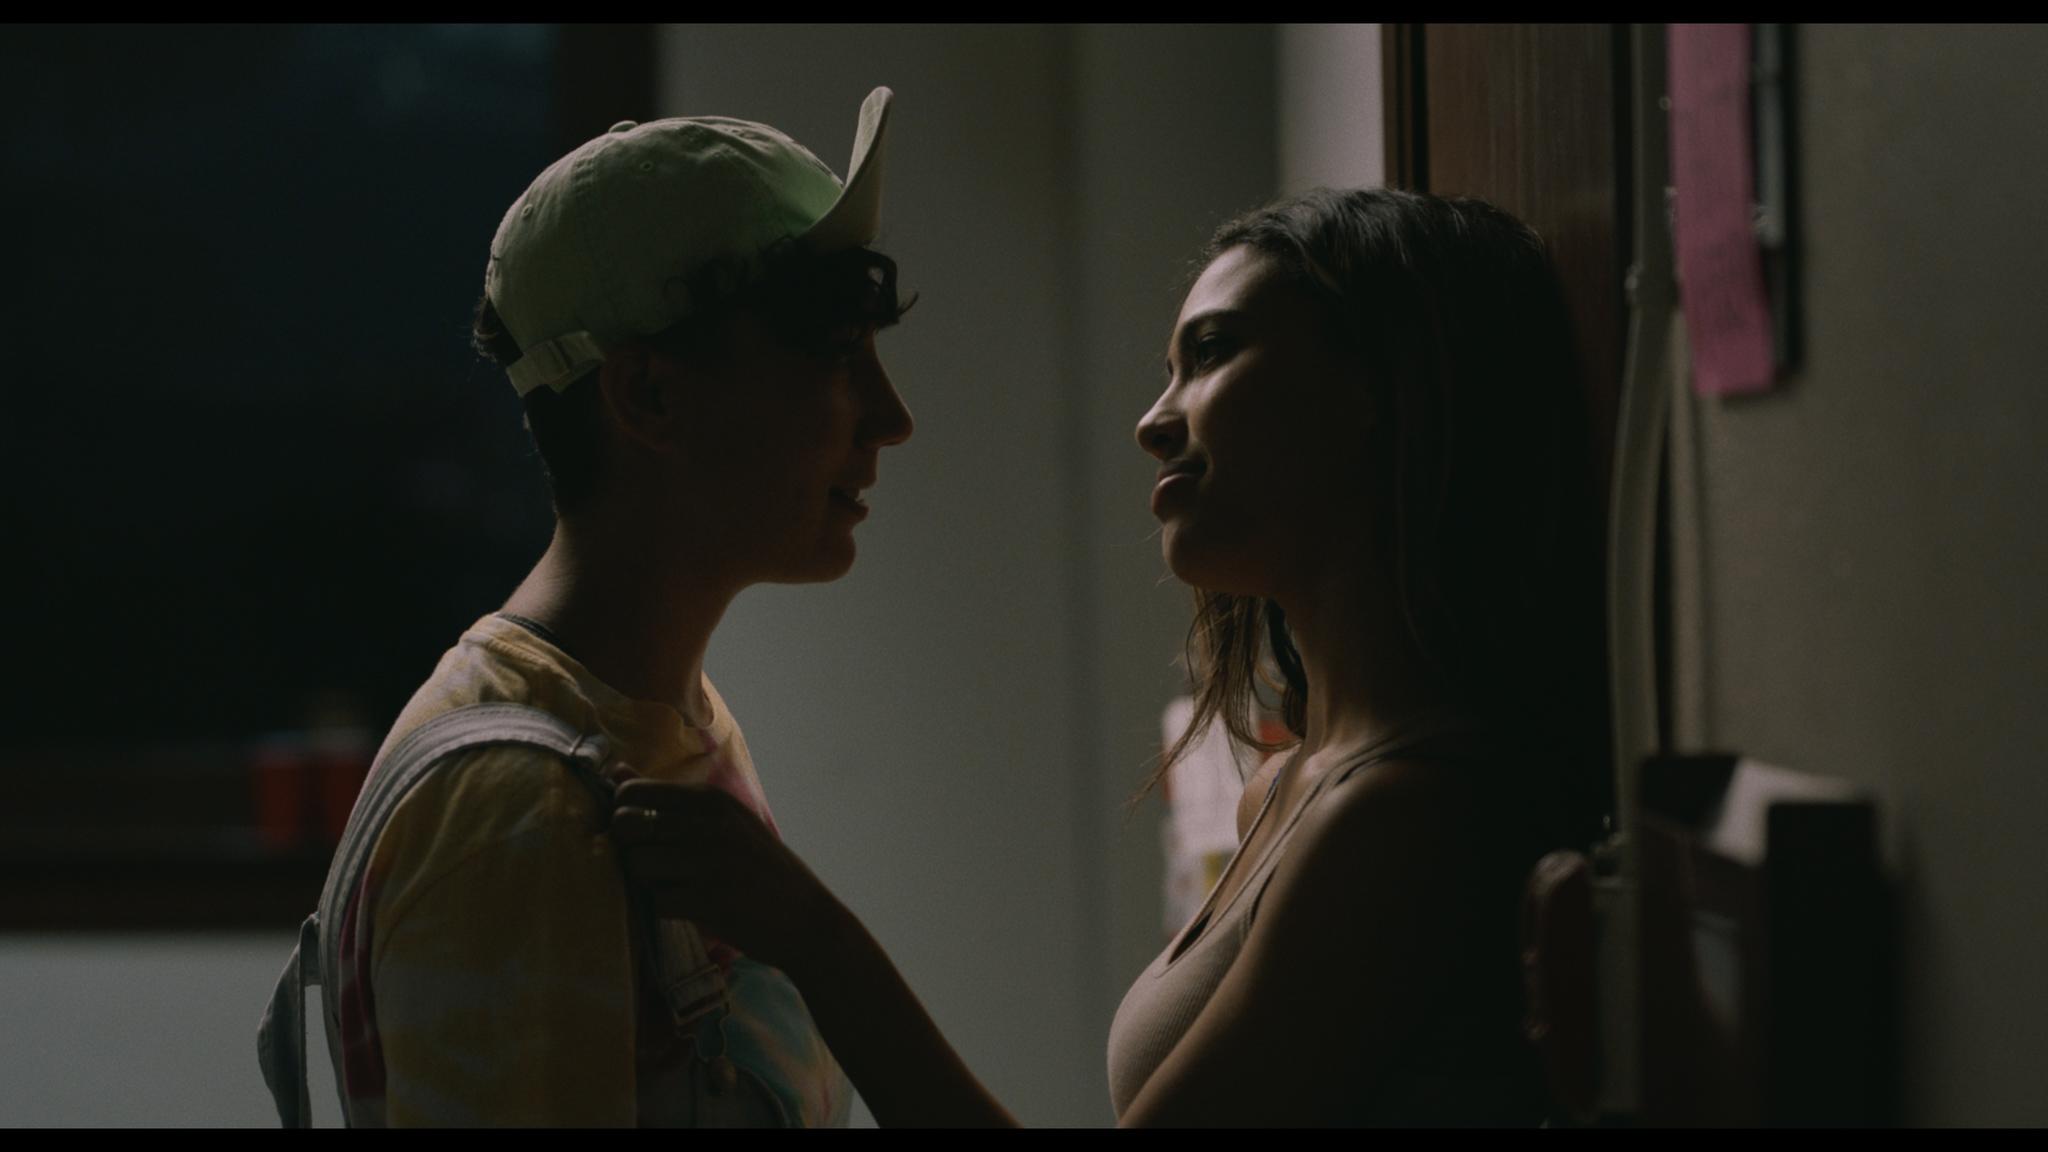 Actors: Victoria Ortiz and Kara Royster (shot by Robin Roemer (robinroemer.com))